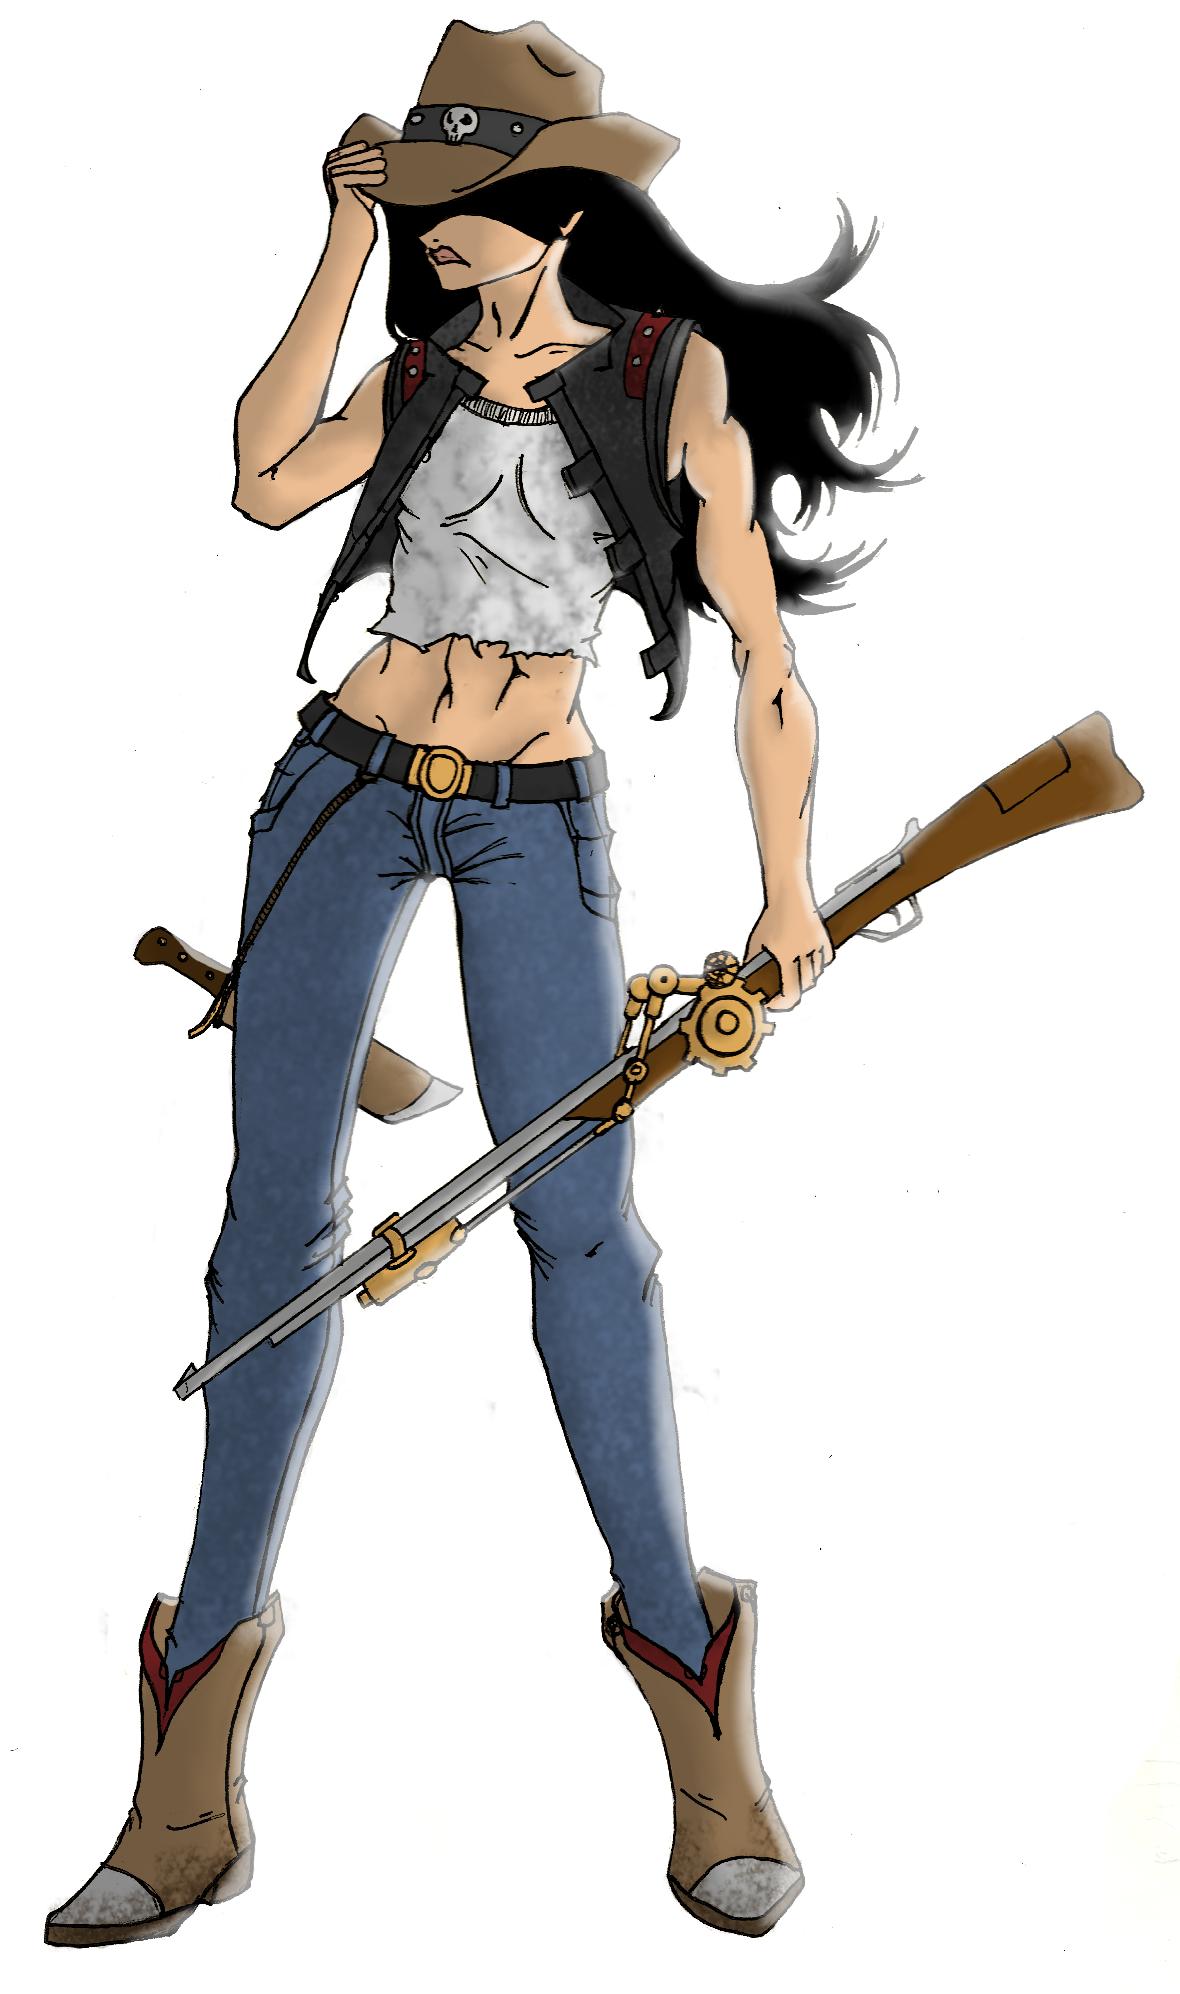 Character: Sidewinder